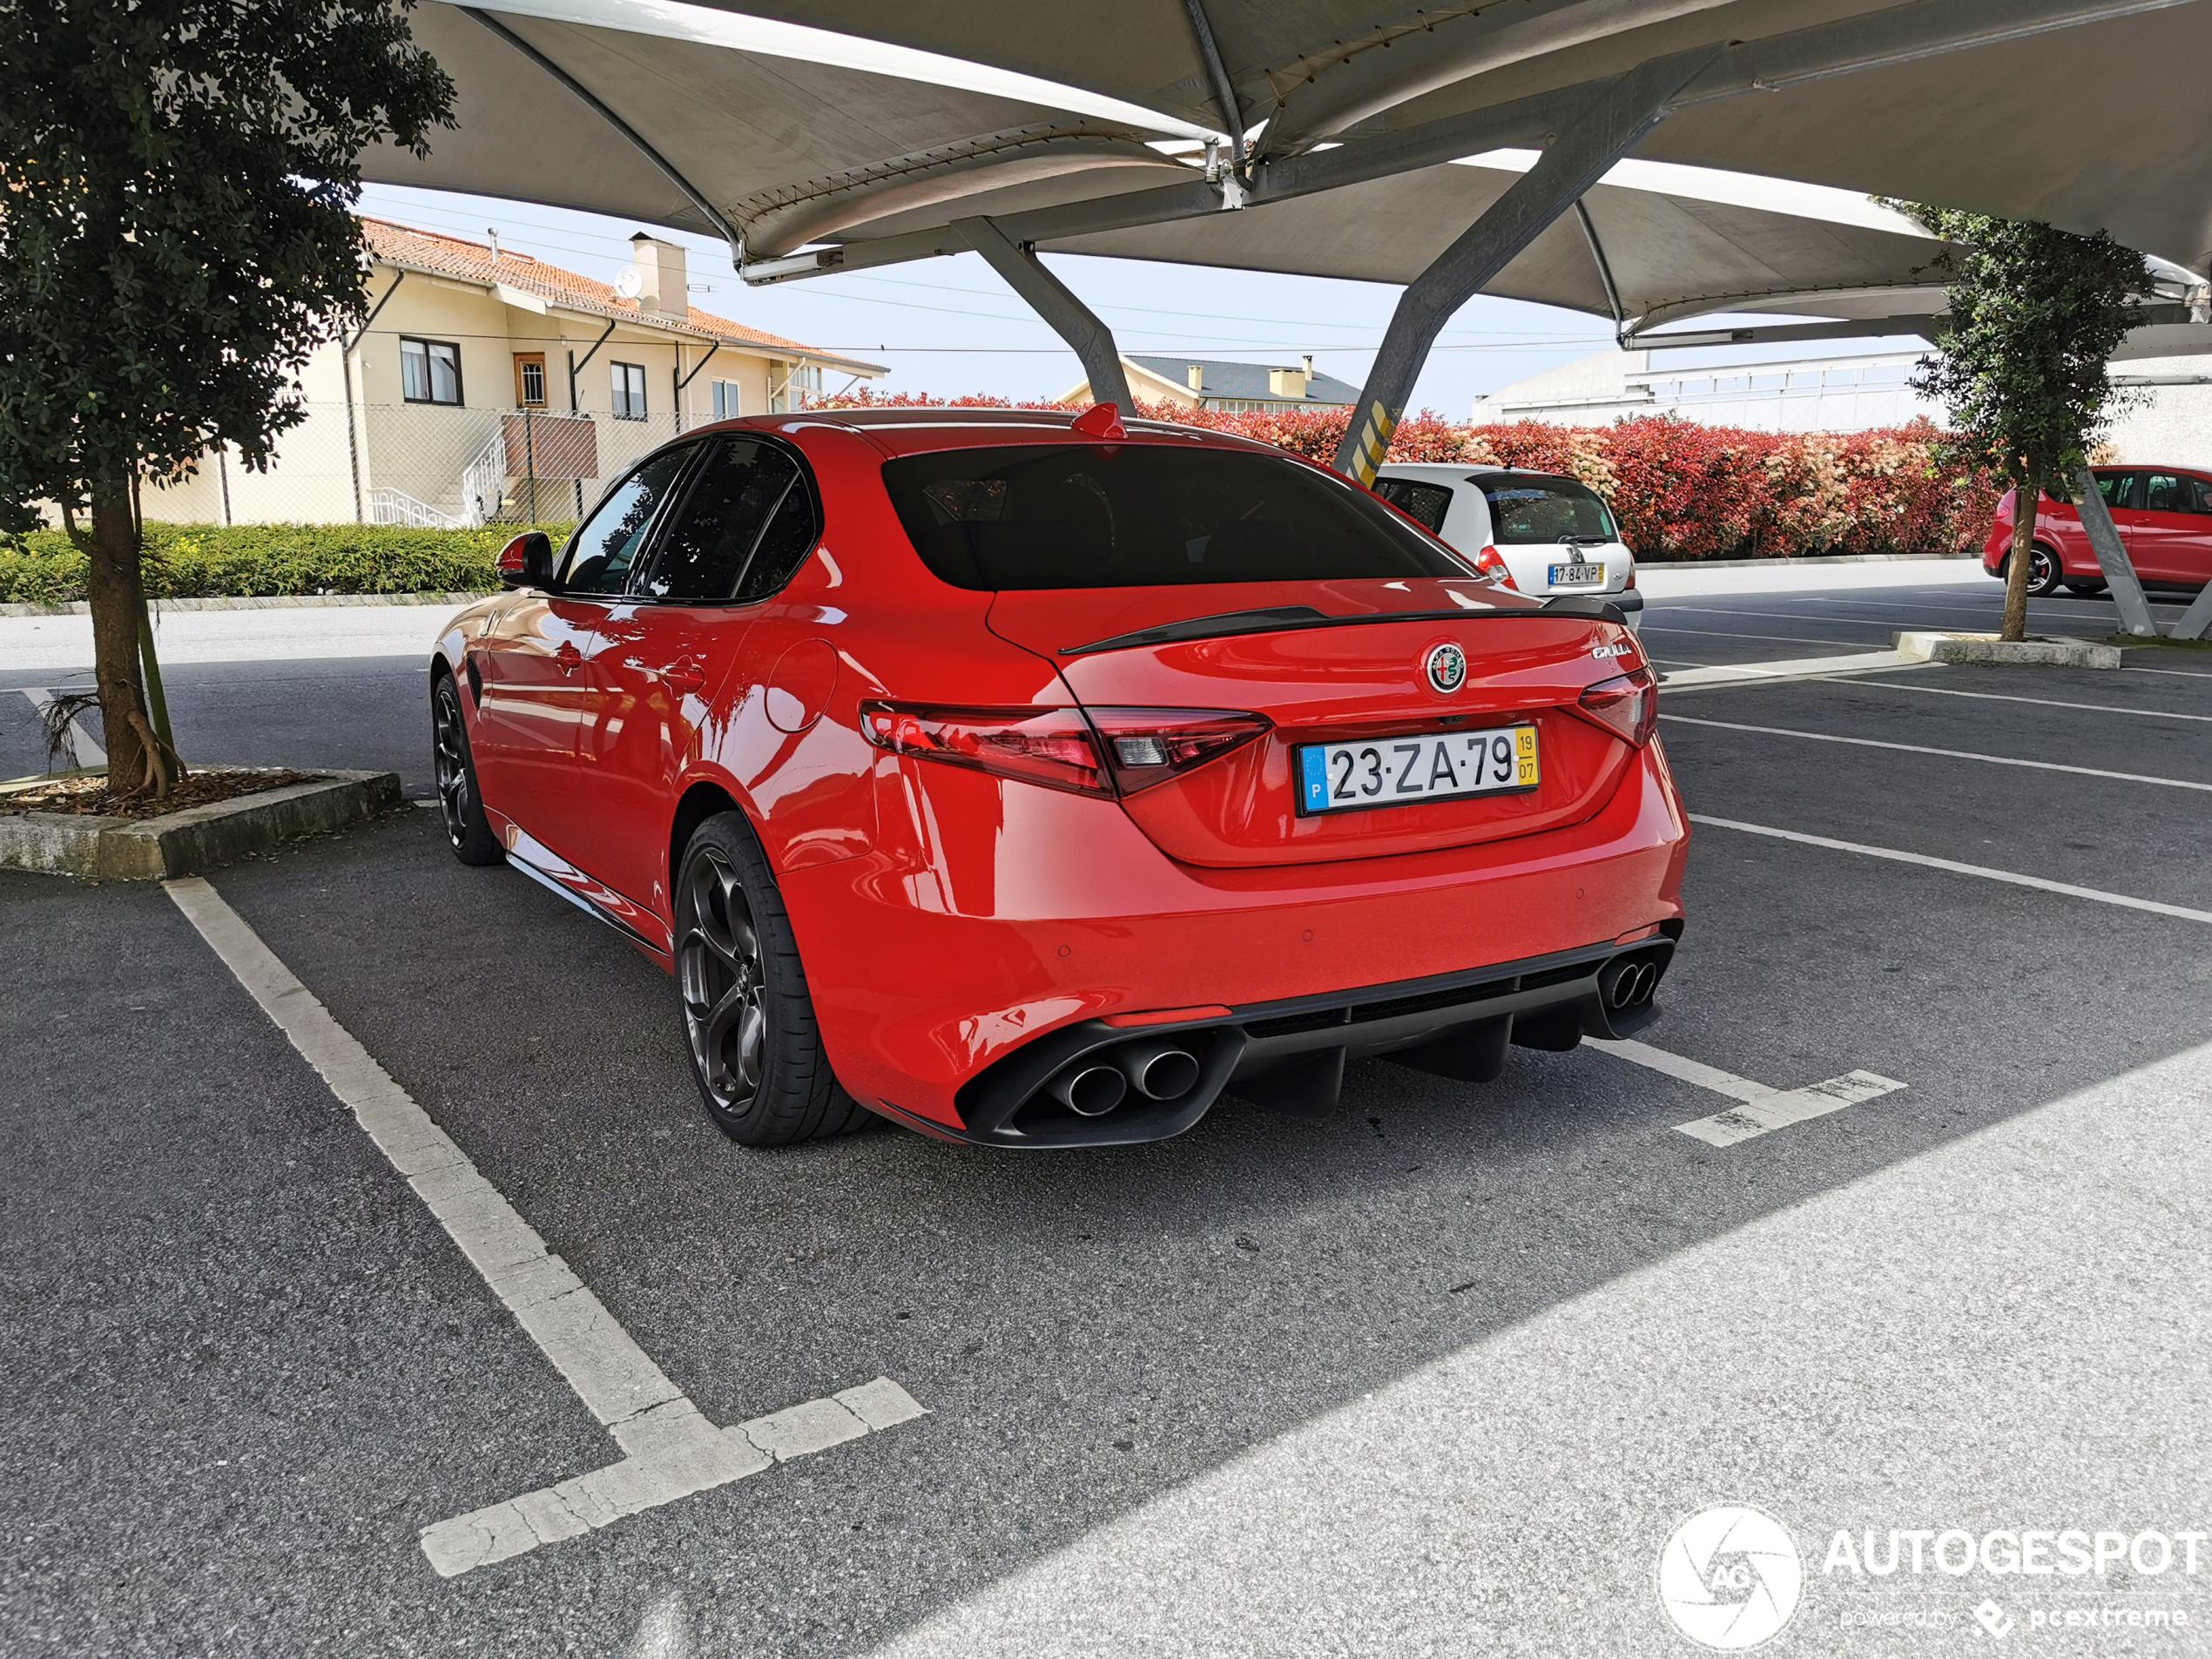 Alfa RomeoGiulia Quadrifoglio